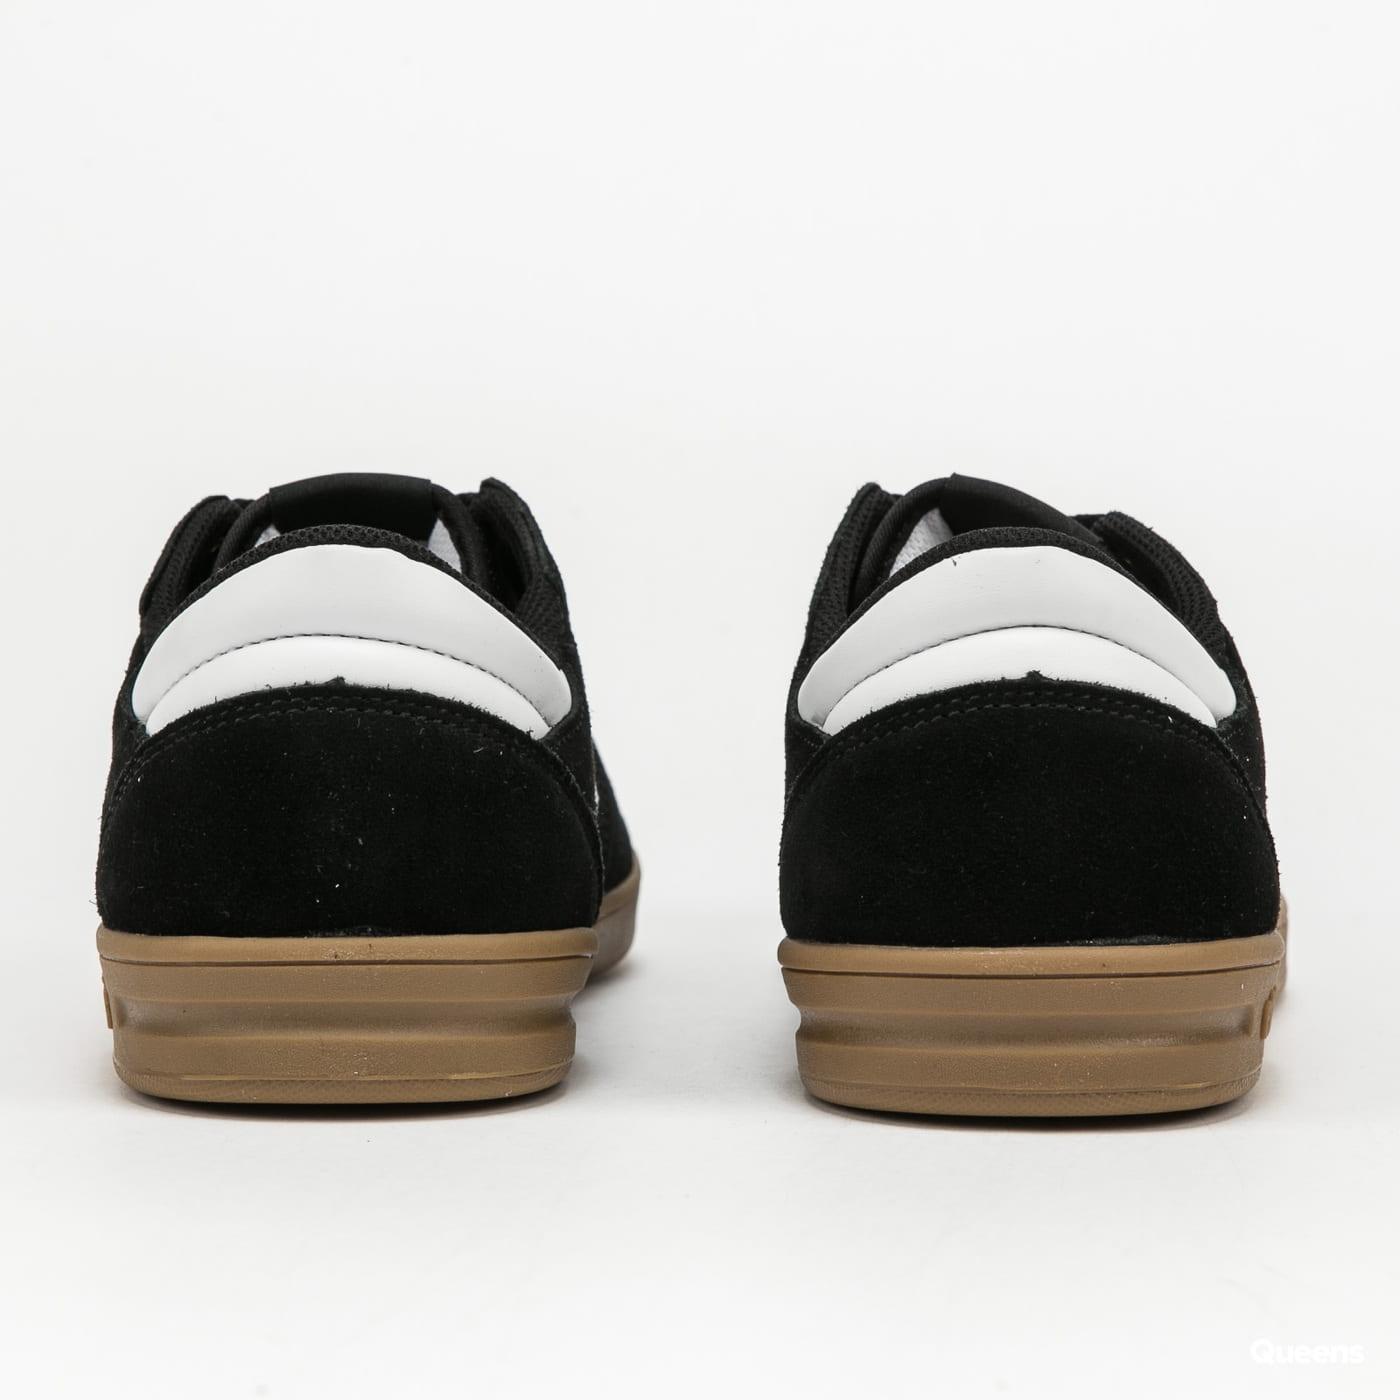 etnies Windrow black / gum / white